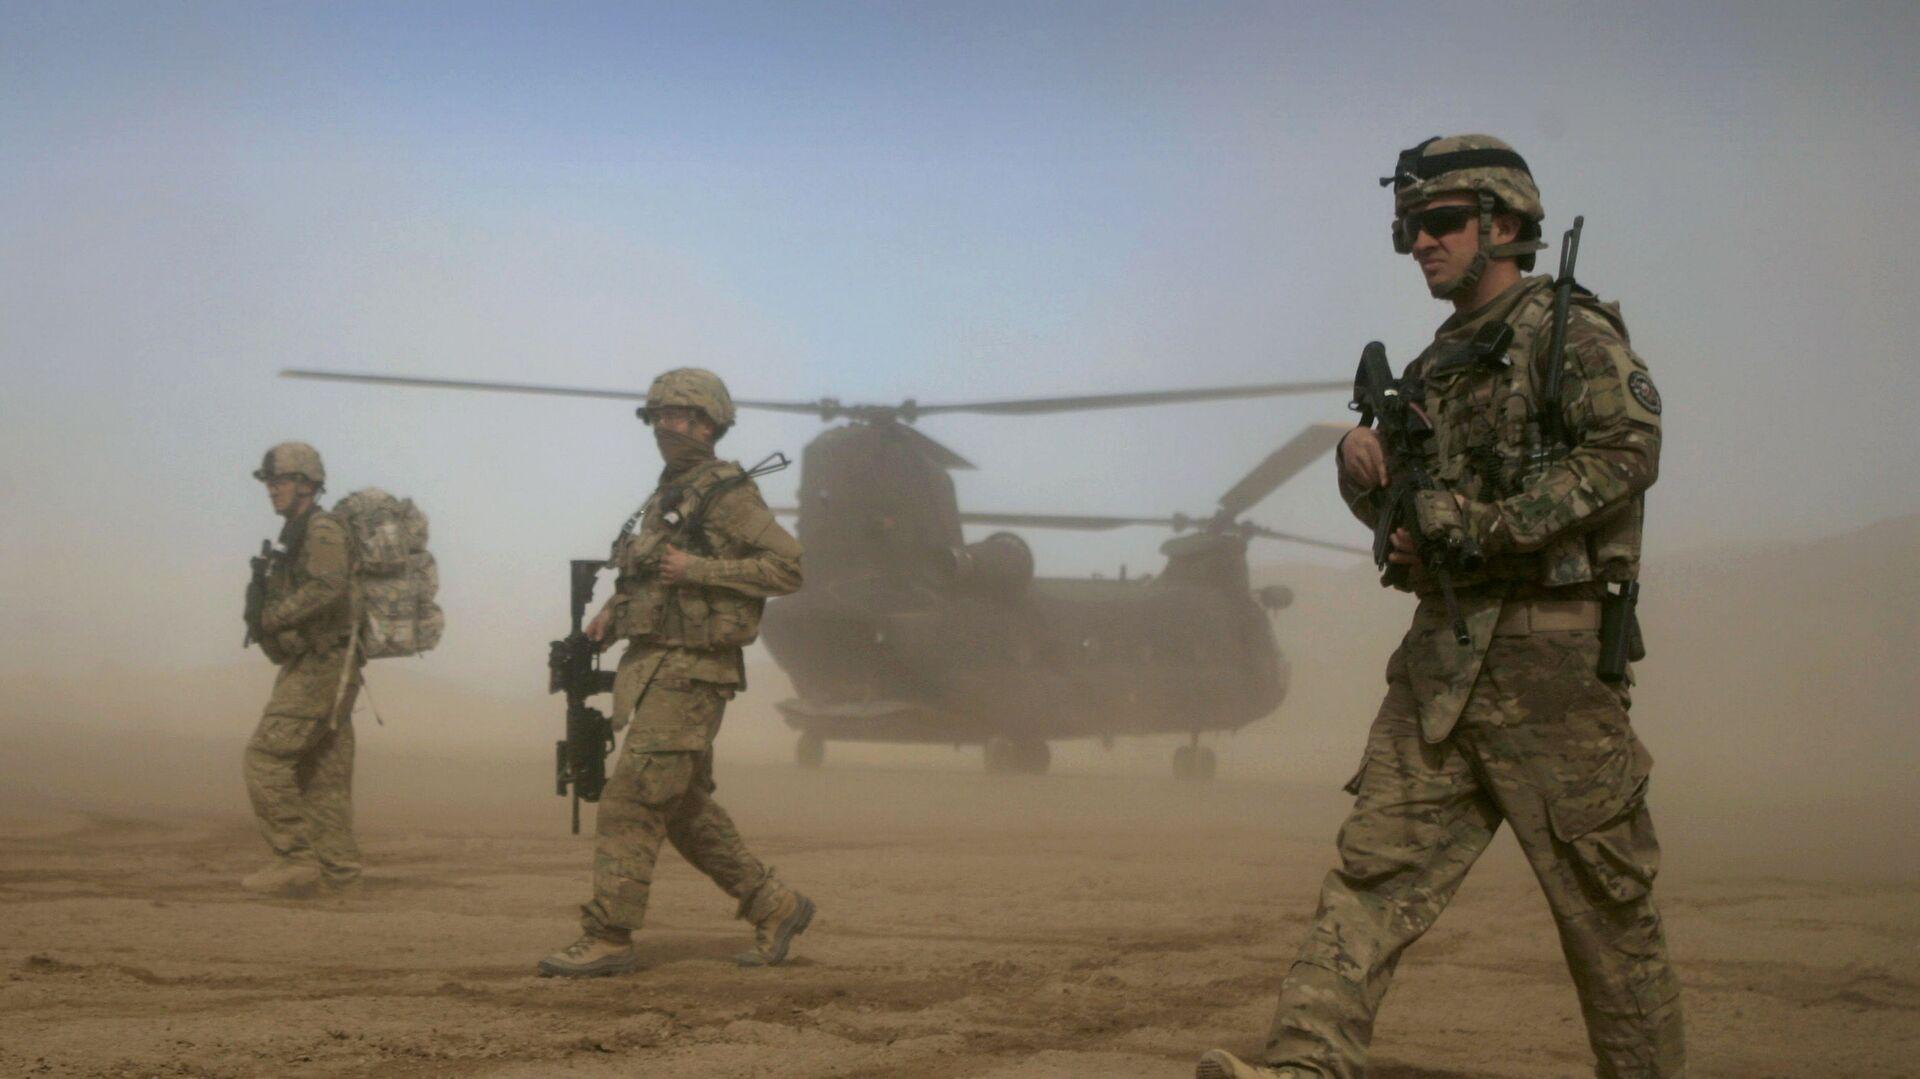 I militari delle truppe americane in Afghanistan  - Sputnik Italia, 1920, 13.07.2021